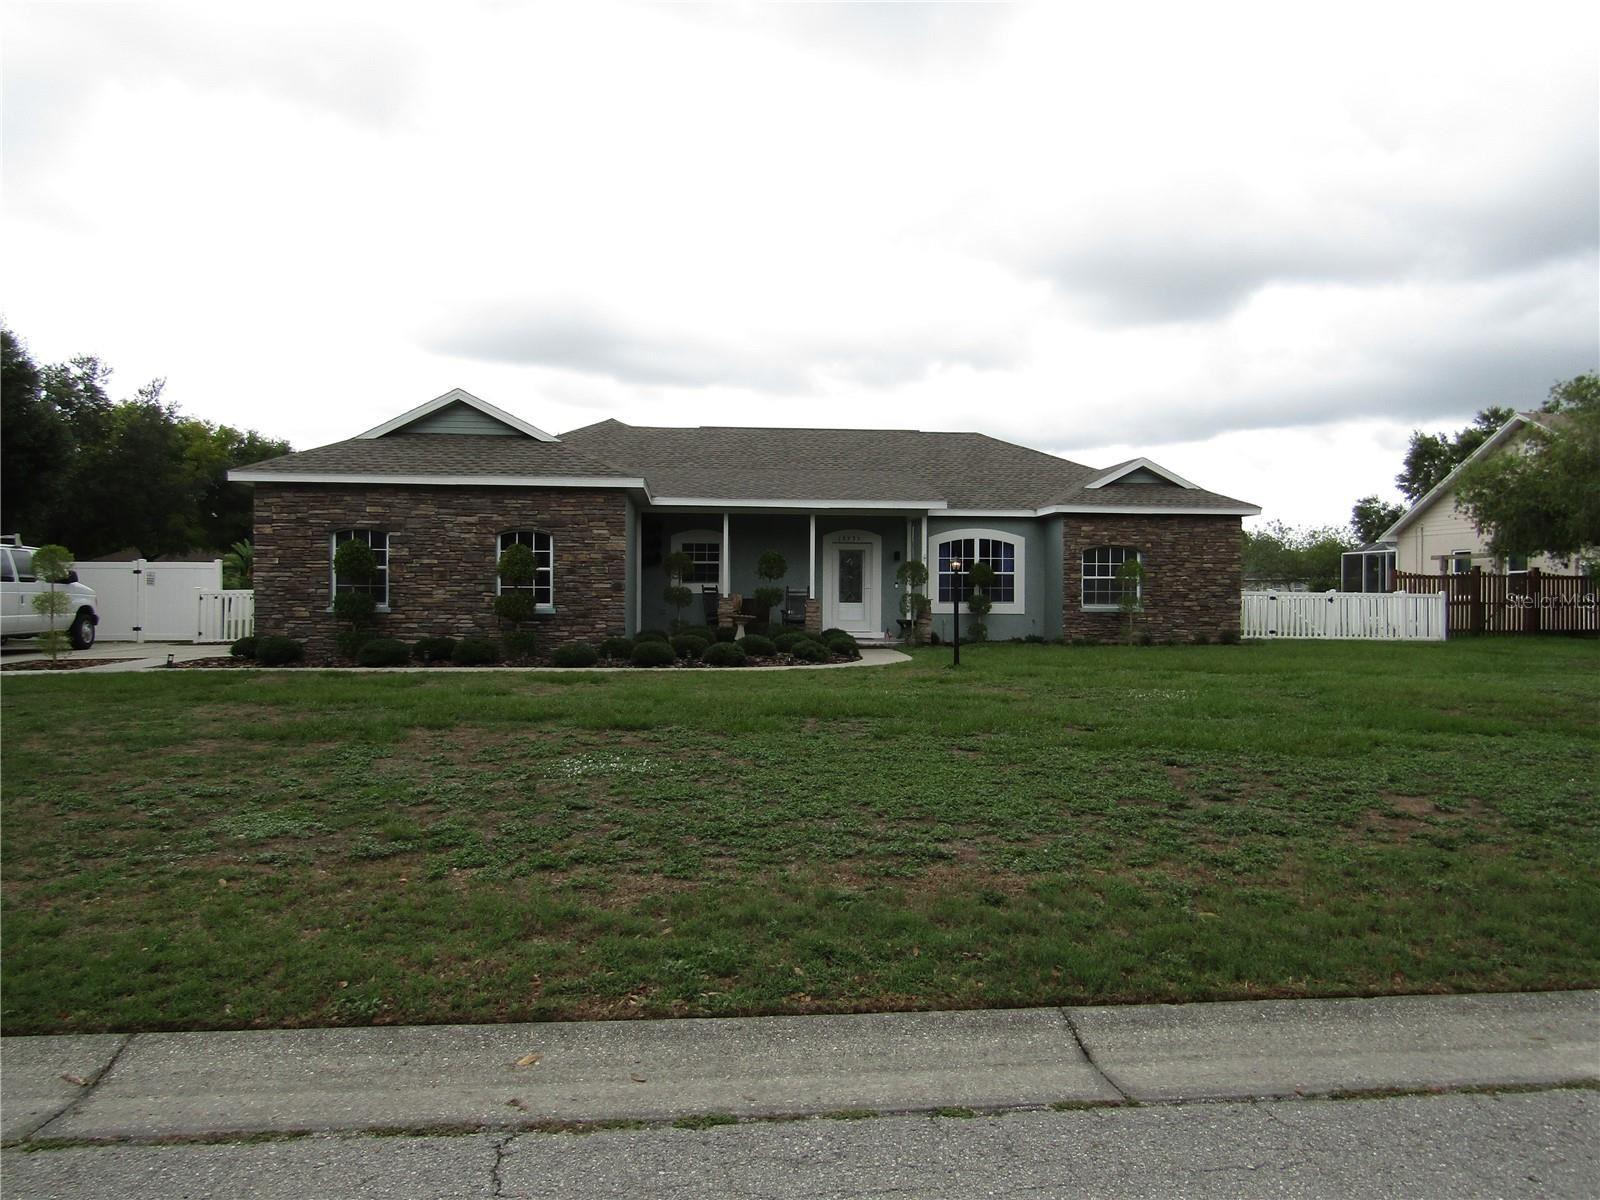 Photo of 13535 4TH AVENUE NE, BRADENTON, FL 34212 (MLS # A4503453)